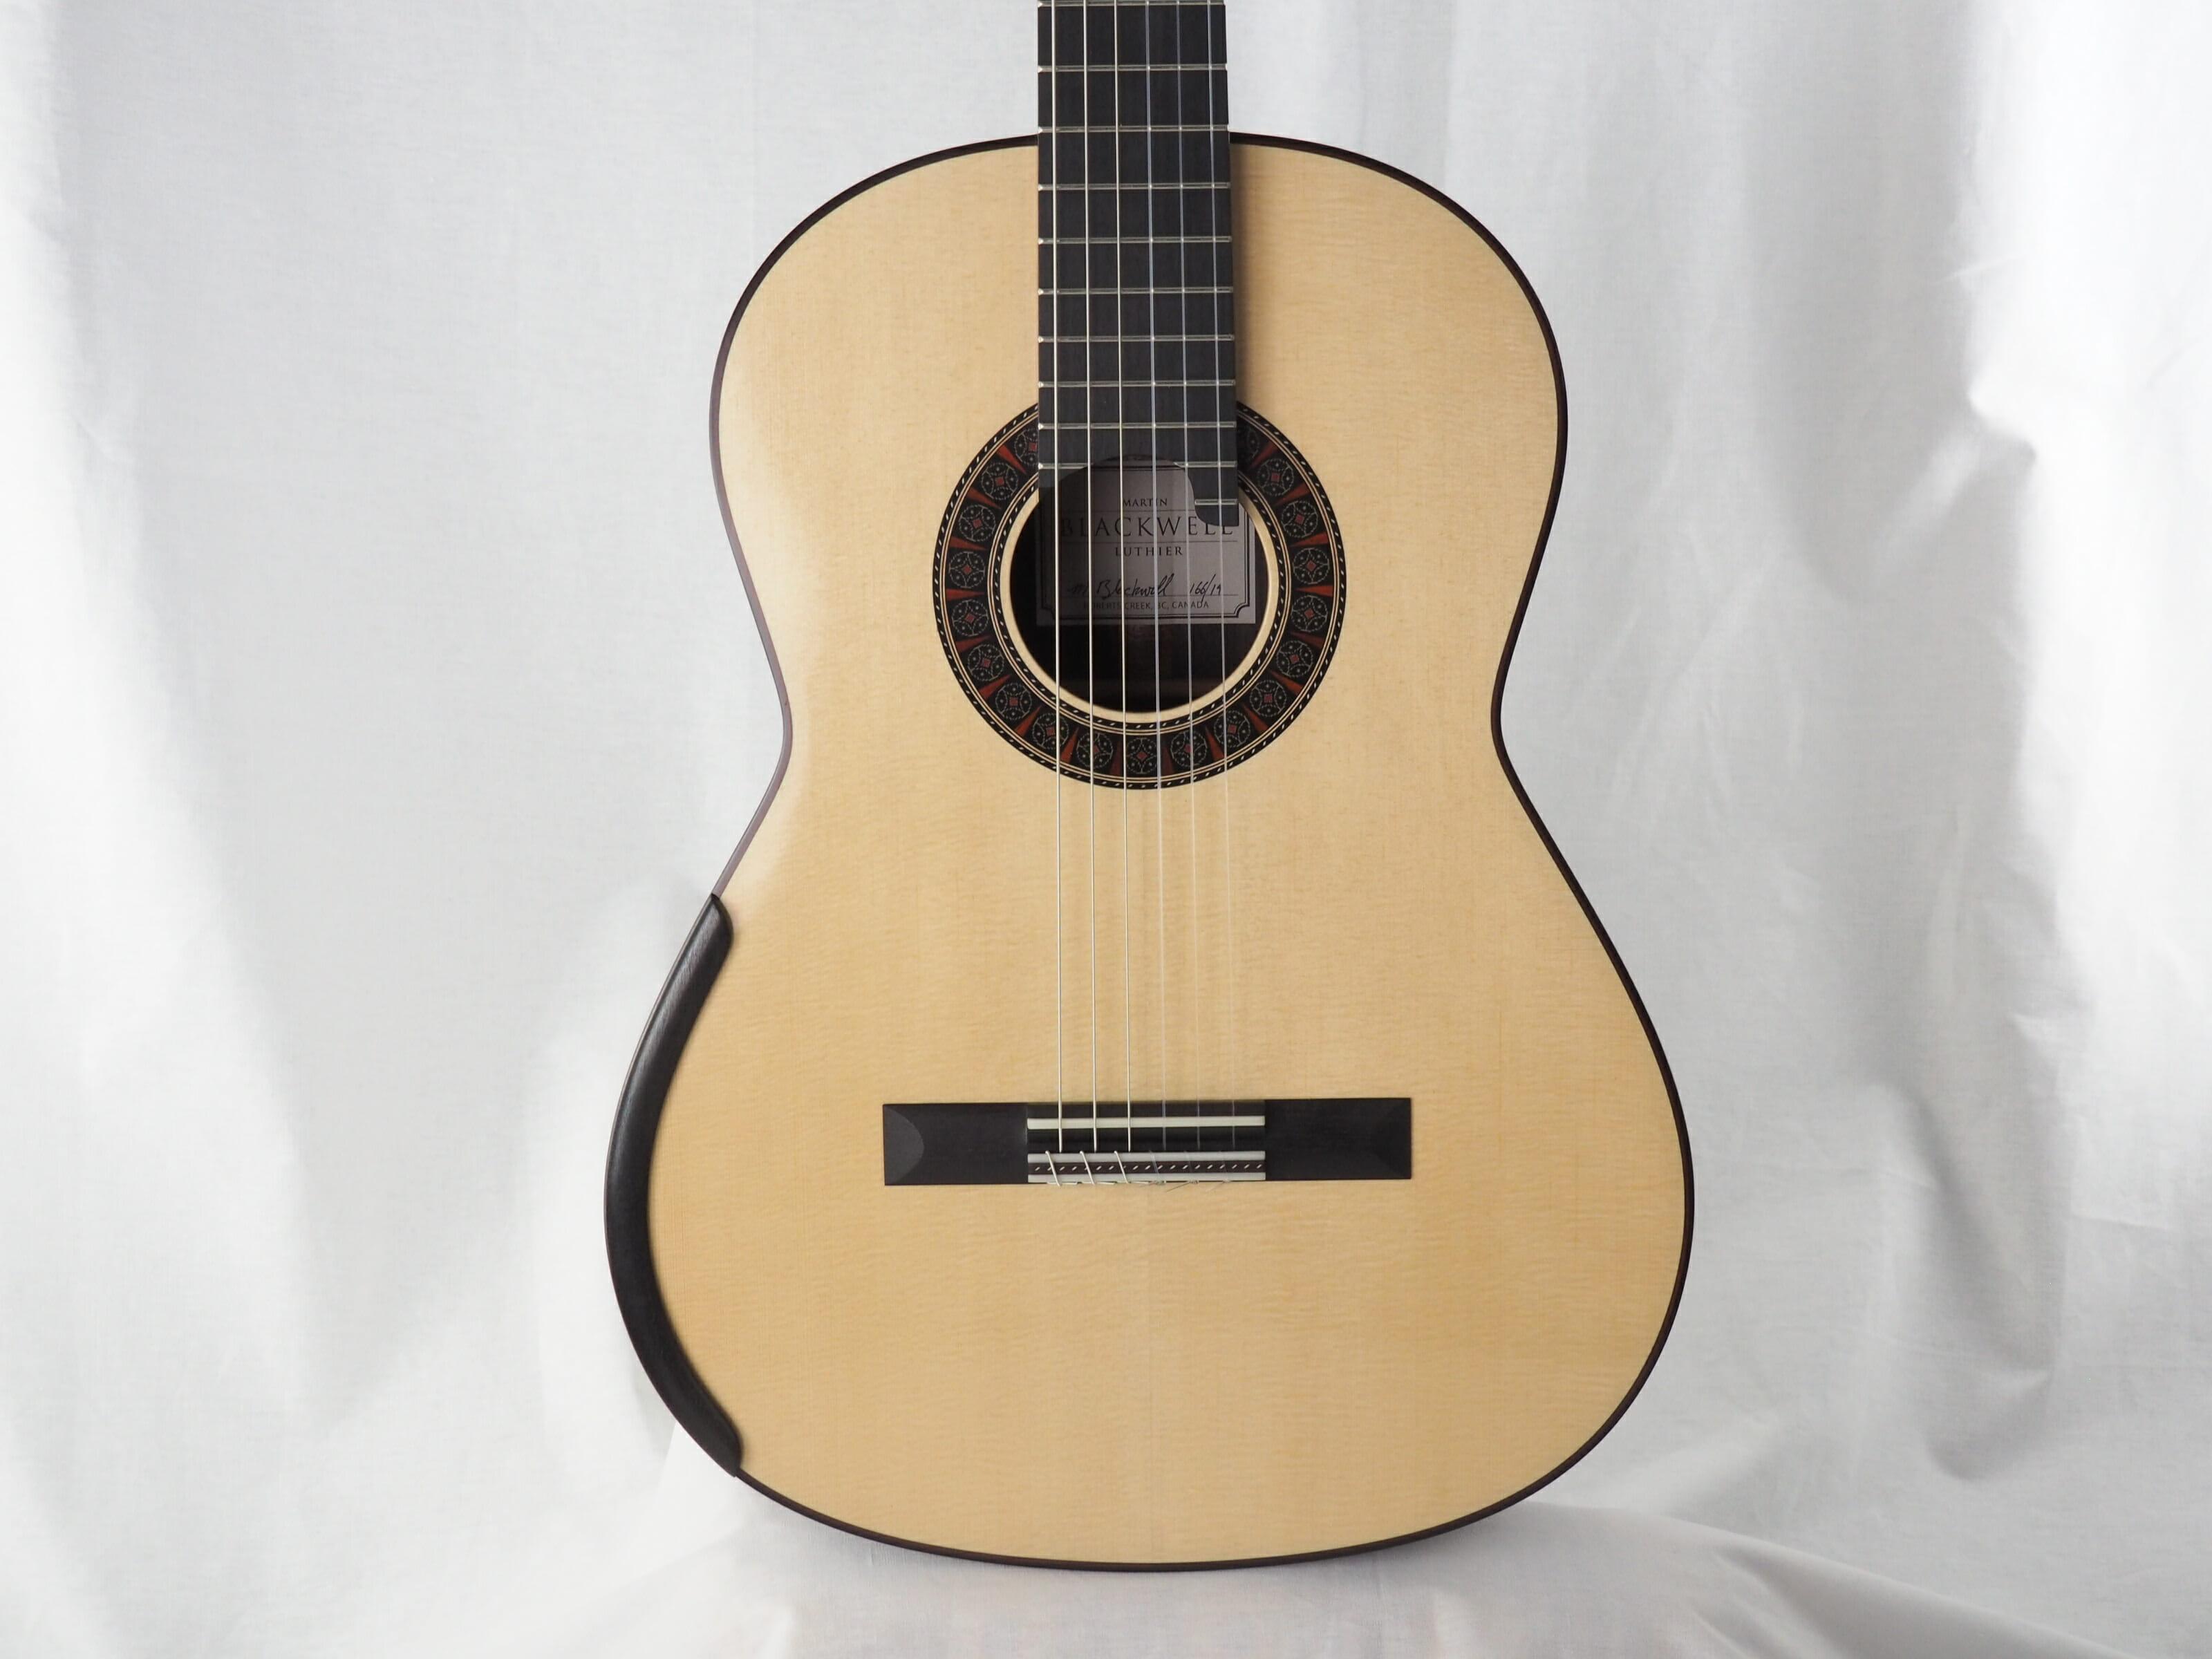 Martin Blackwell luthier guitare classique No 19BLA166-08